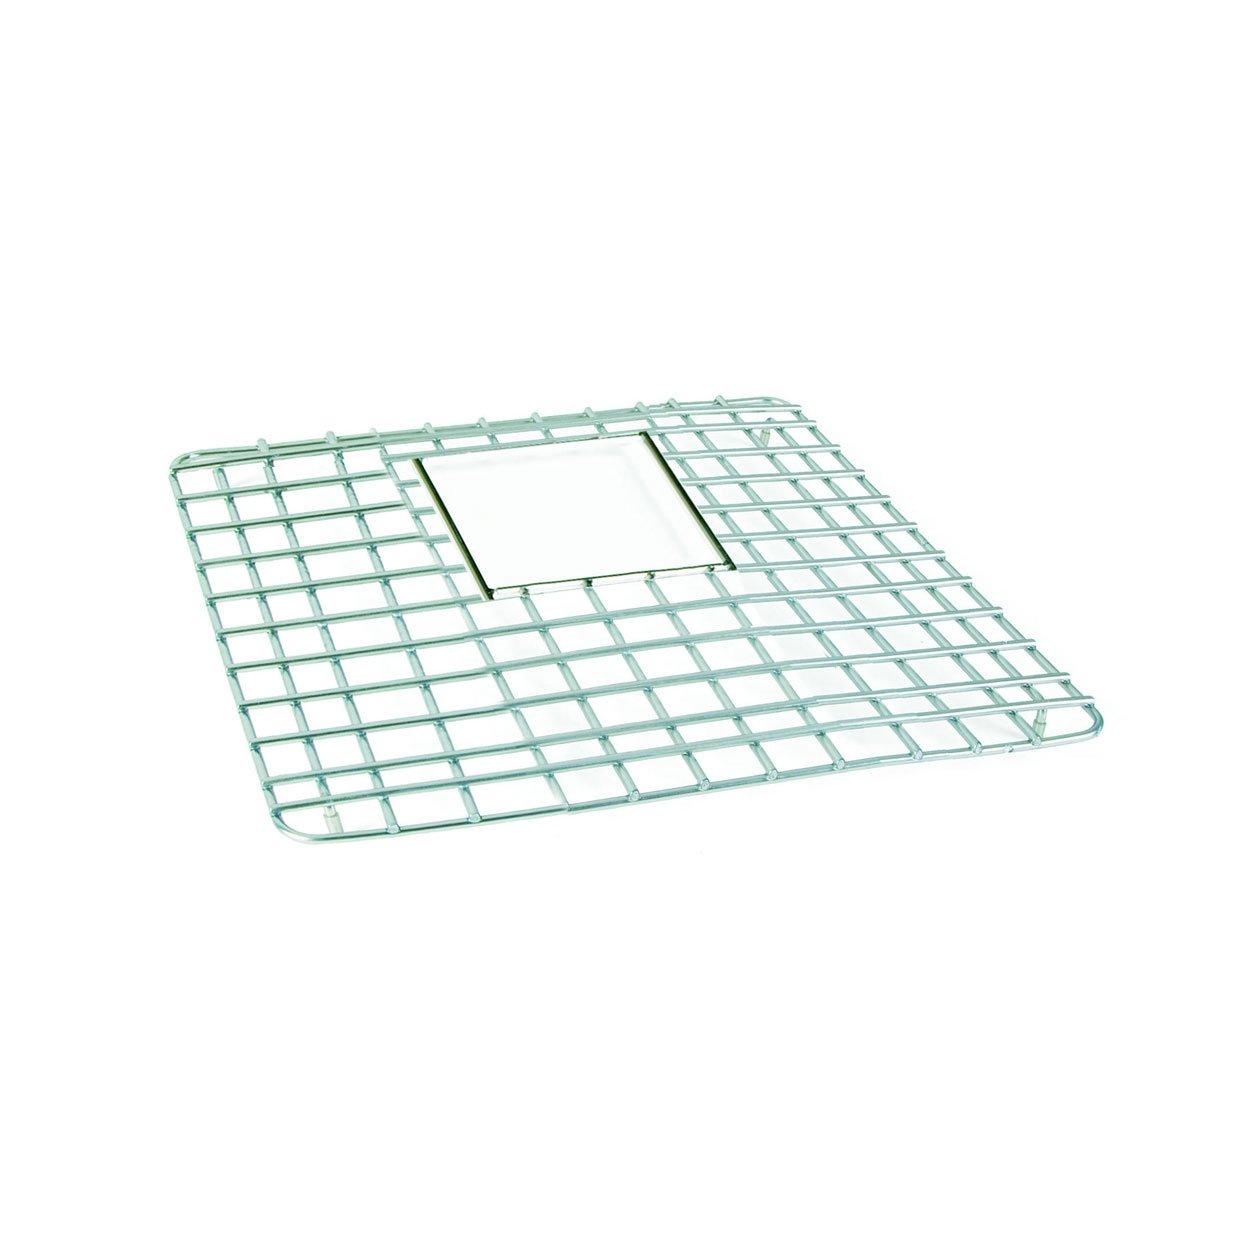 Franke PX-18S Peak Stainless Steel Bottom Protection Grid for PKX11018 Sink